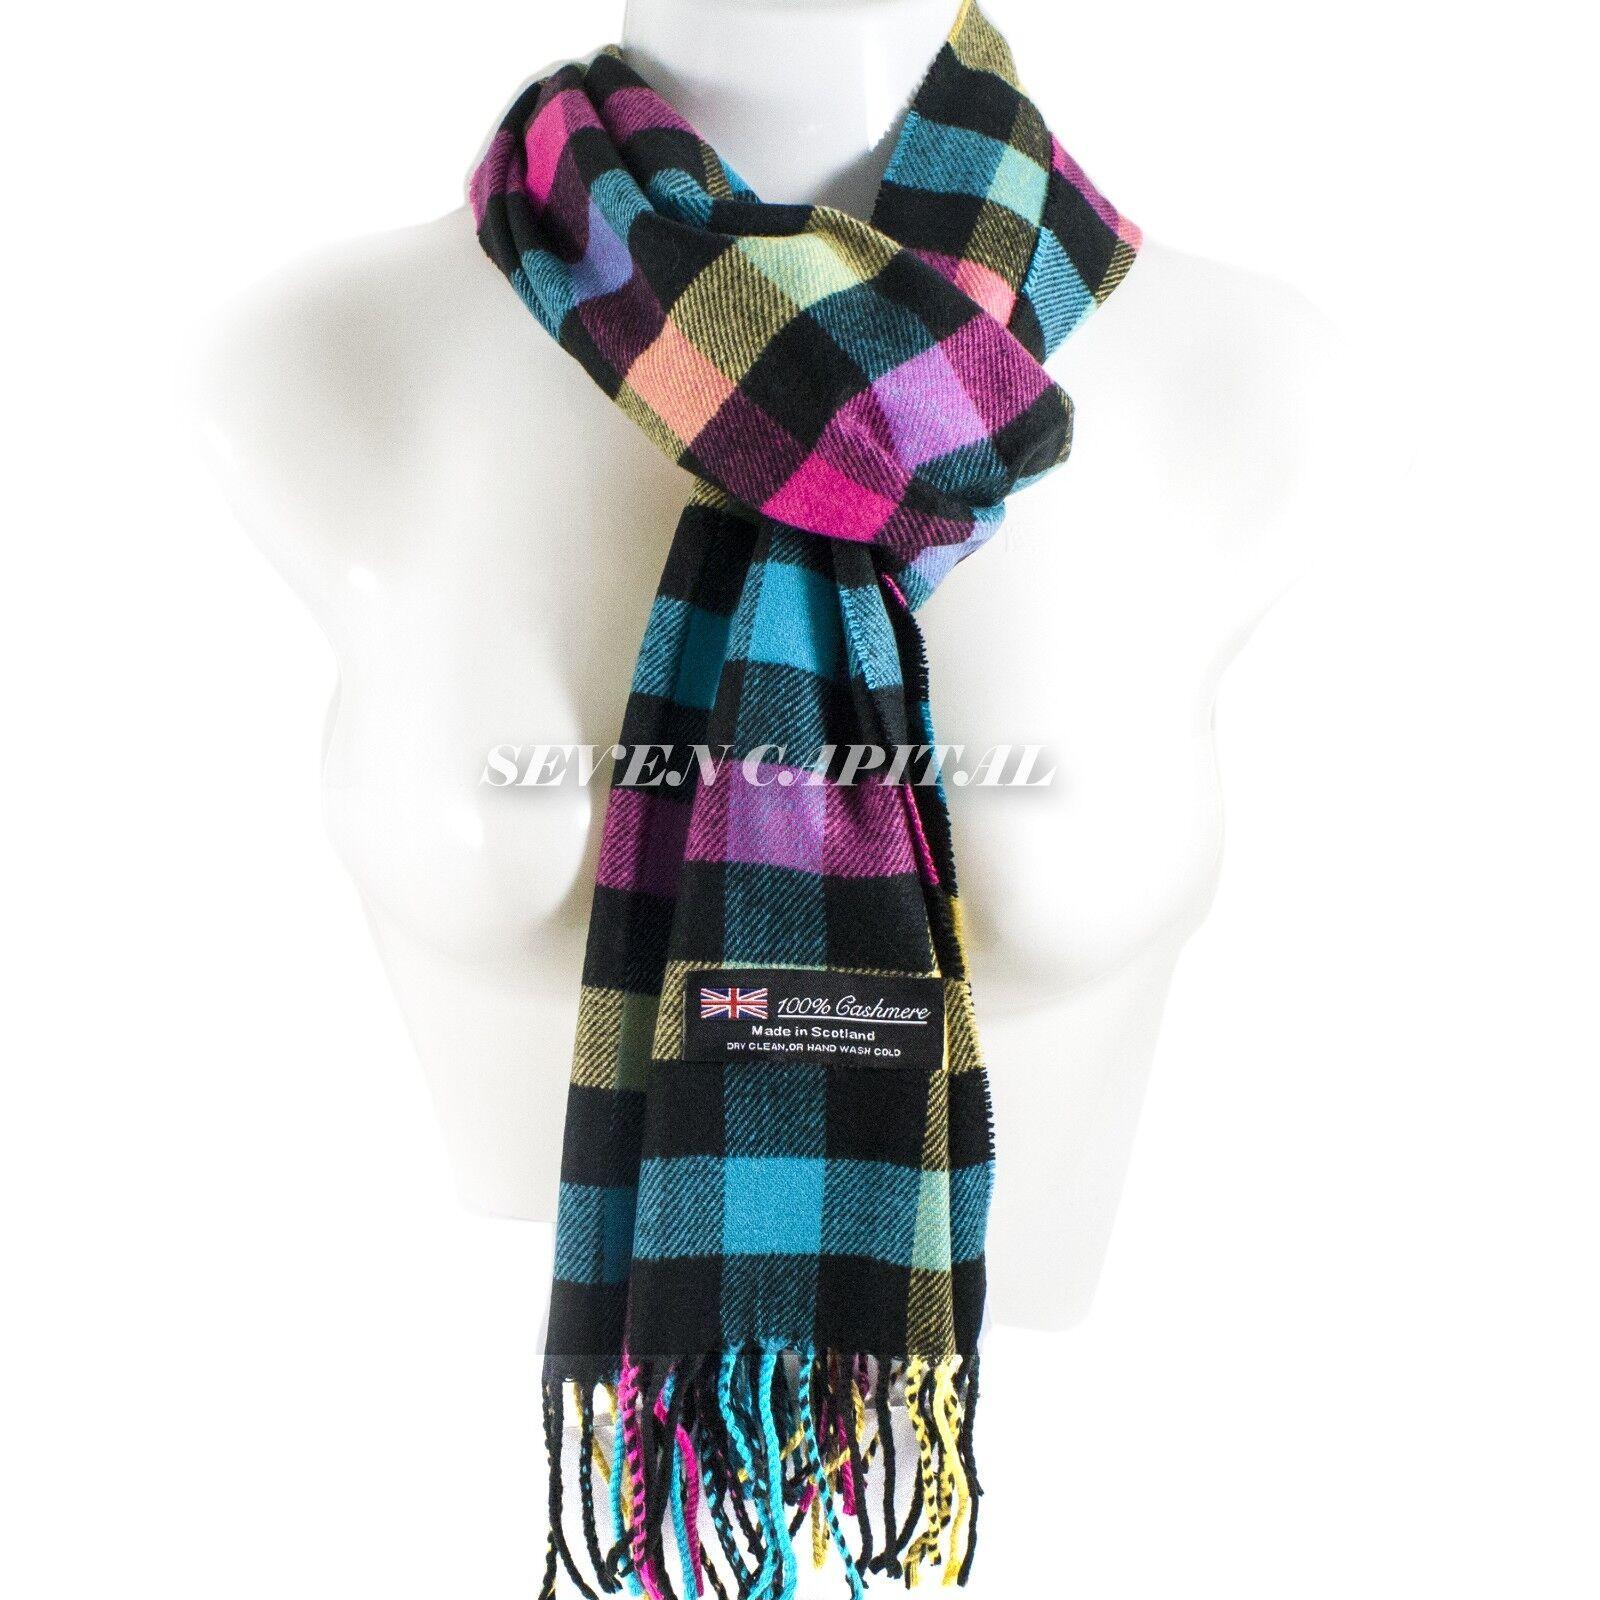 Mens Womens Winter Warm SCOTLAND Made 100% CASHMERE Scarf Scarves Plaid Wool 5. Plaid: Purple/Pink/Blue/Black/Beige